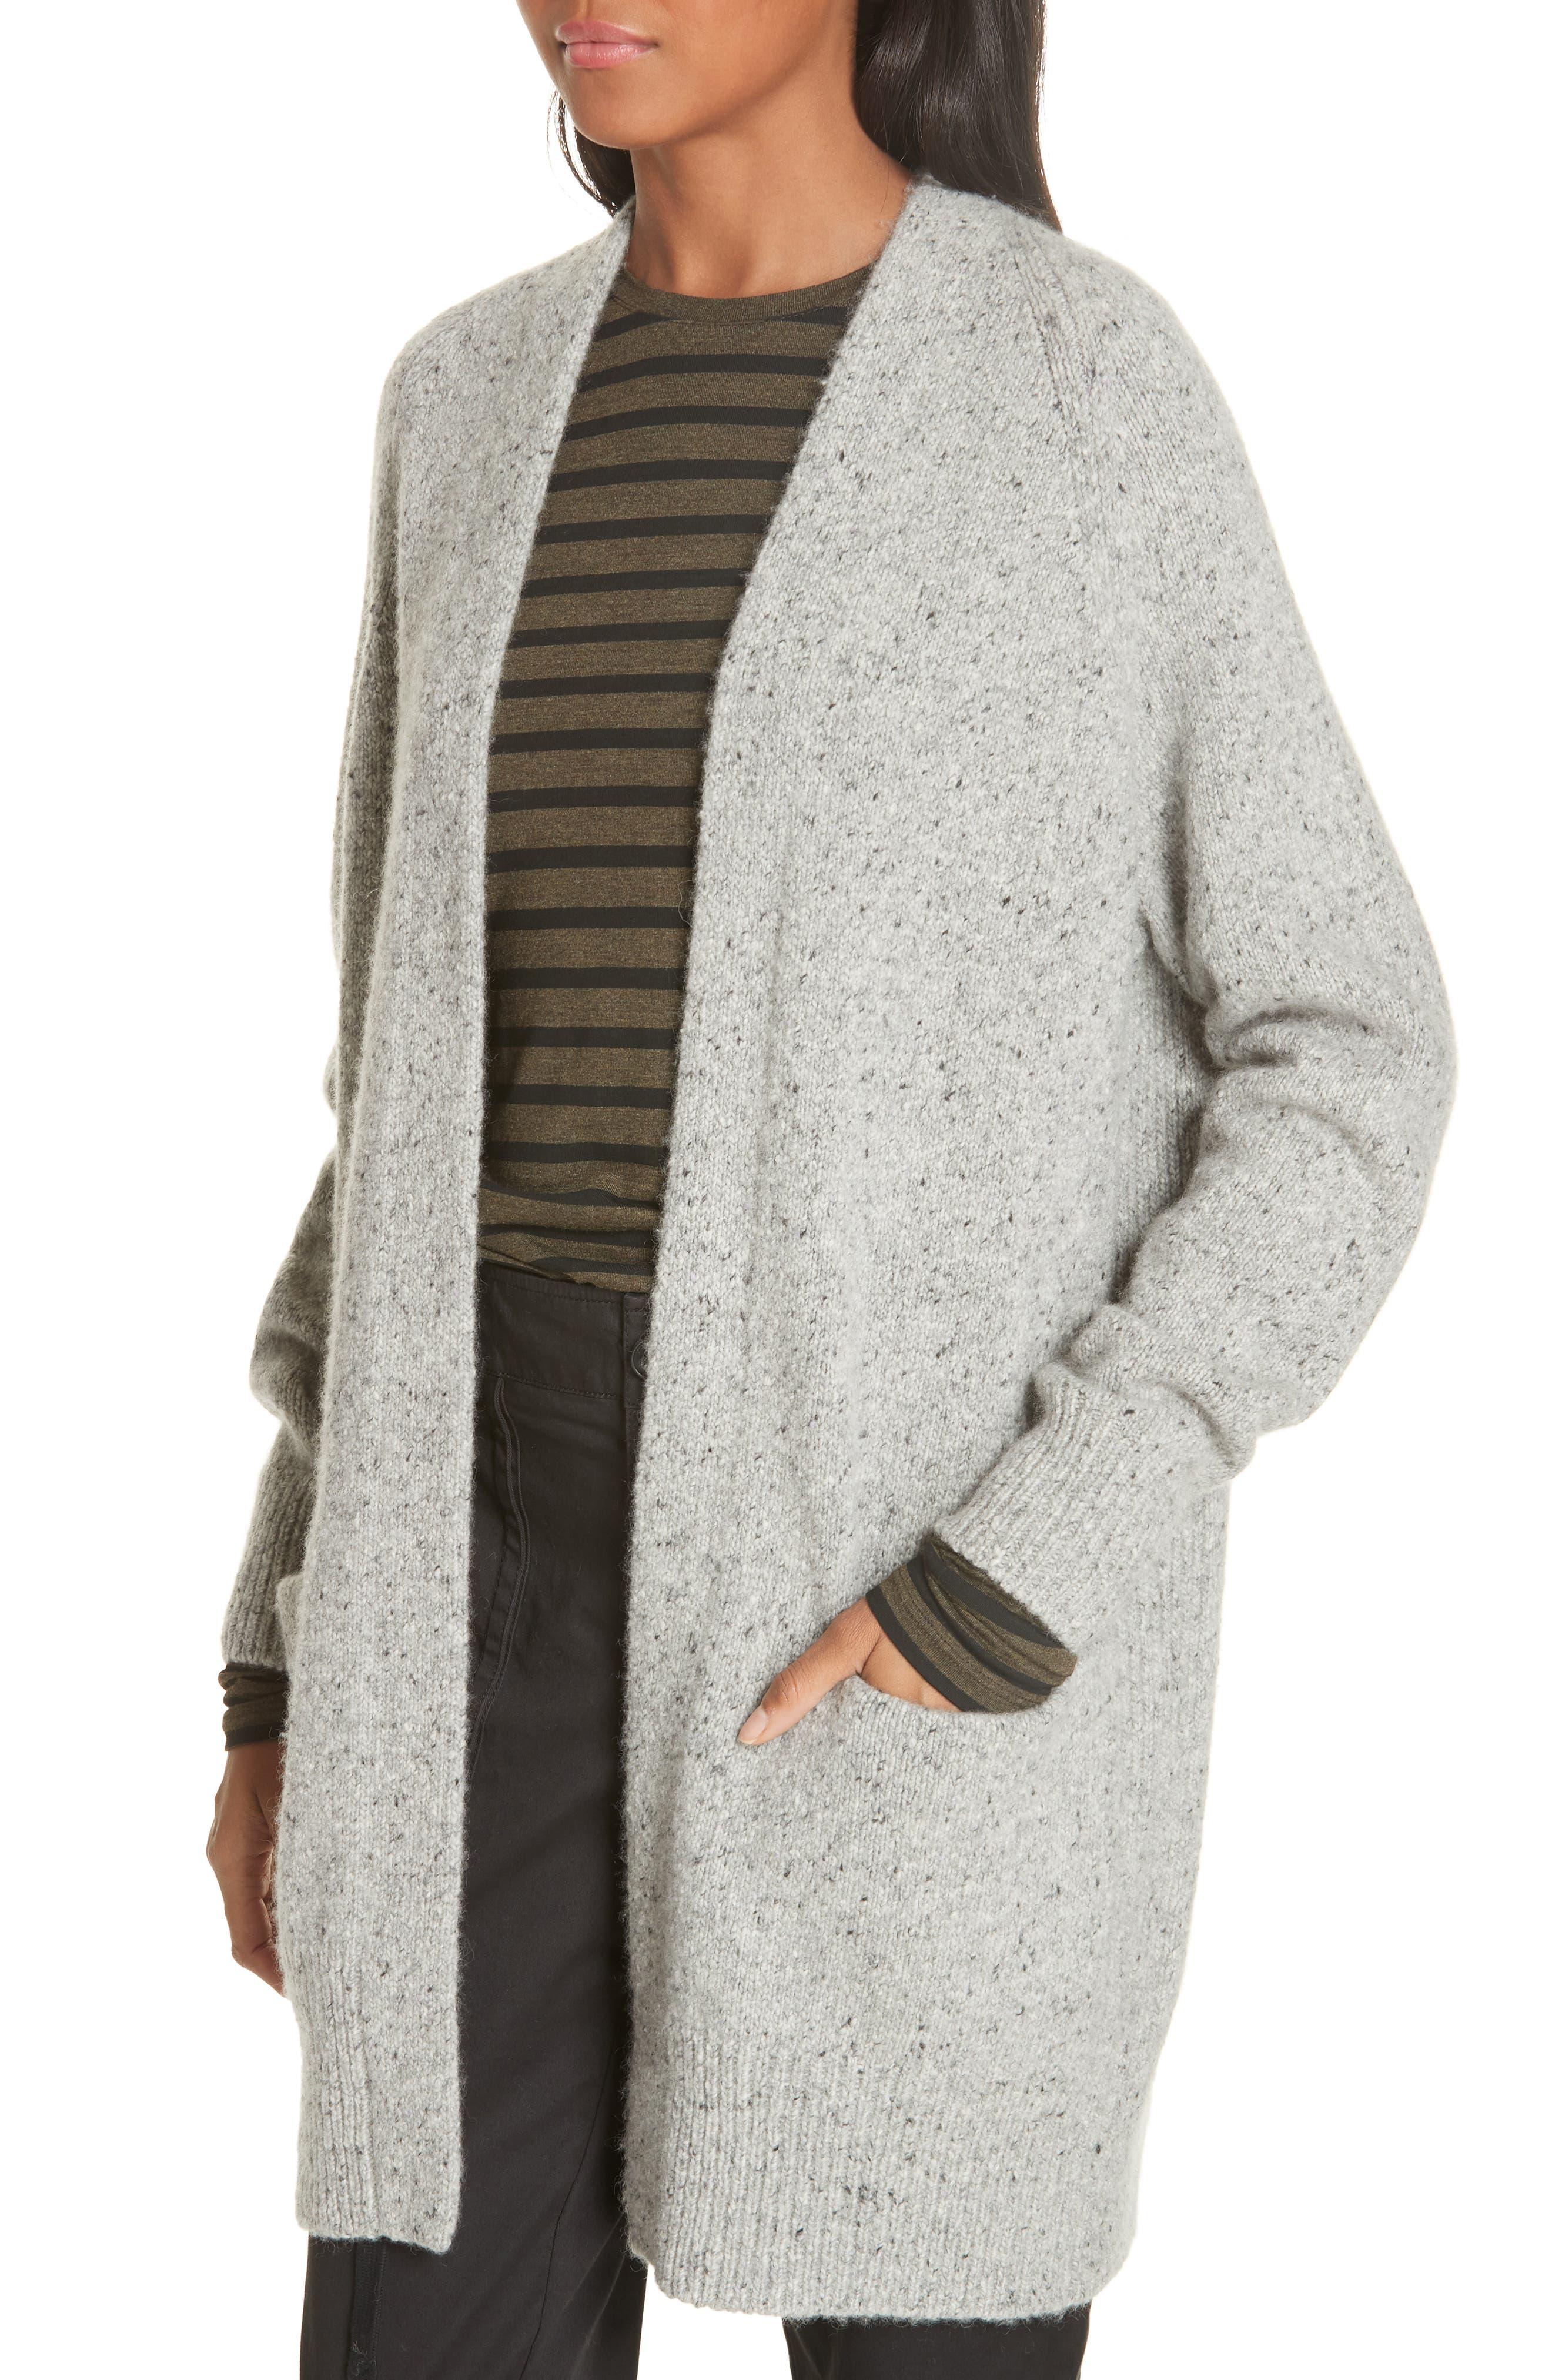 Cashmere Raglan Sleeve Open Front Cardigan,                             Alternate thumbnail 4, color,                             SOFT GREY